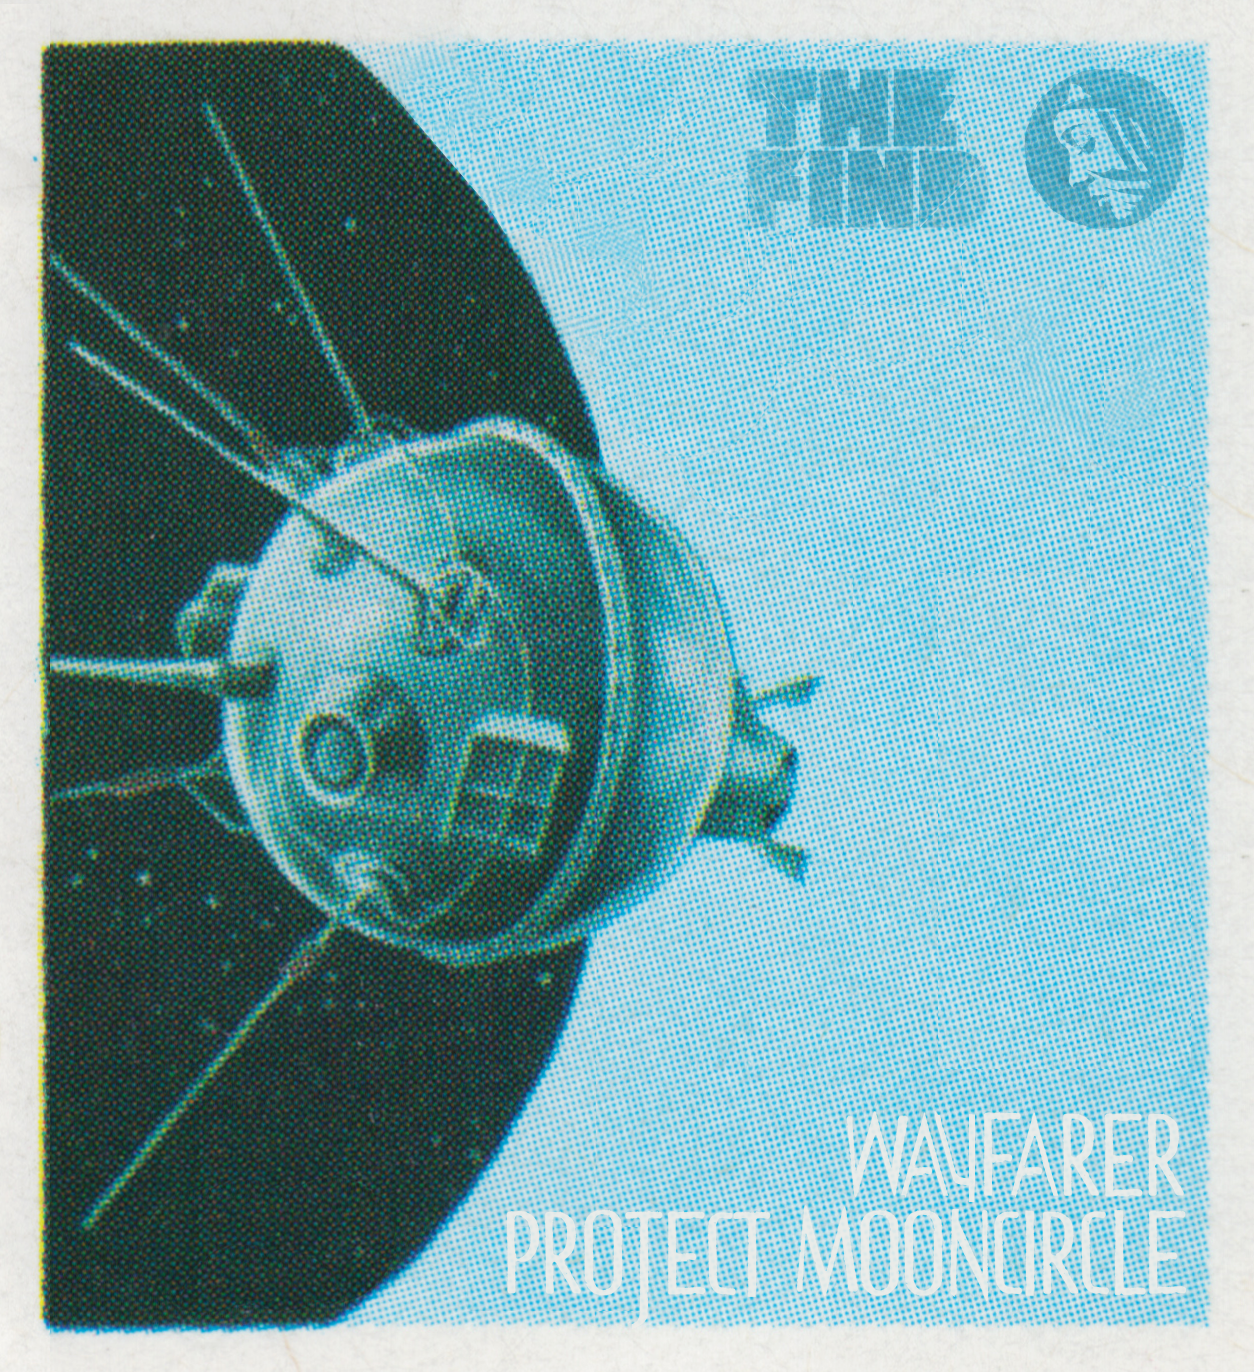 Guest Mix: Gordon Gieseking (of Project: Mooncircle) – Wayfarer